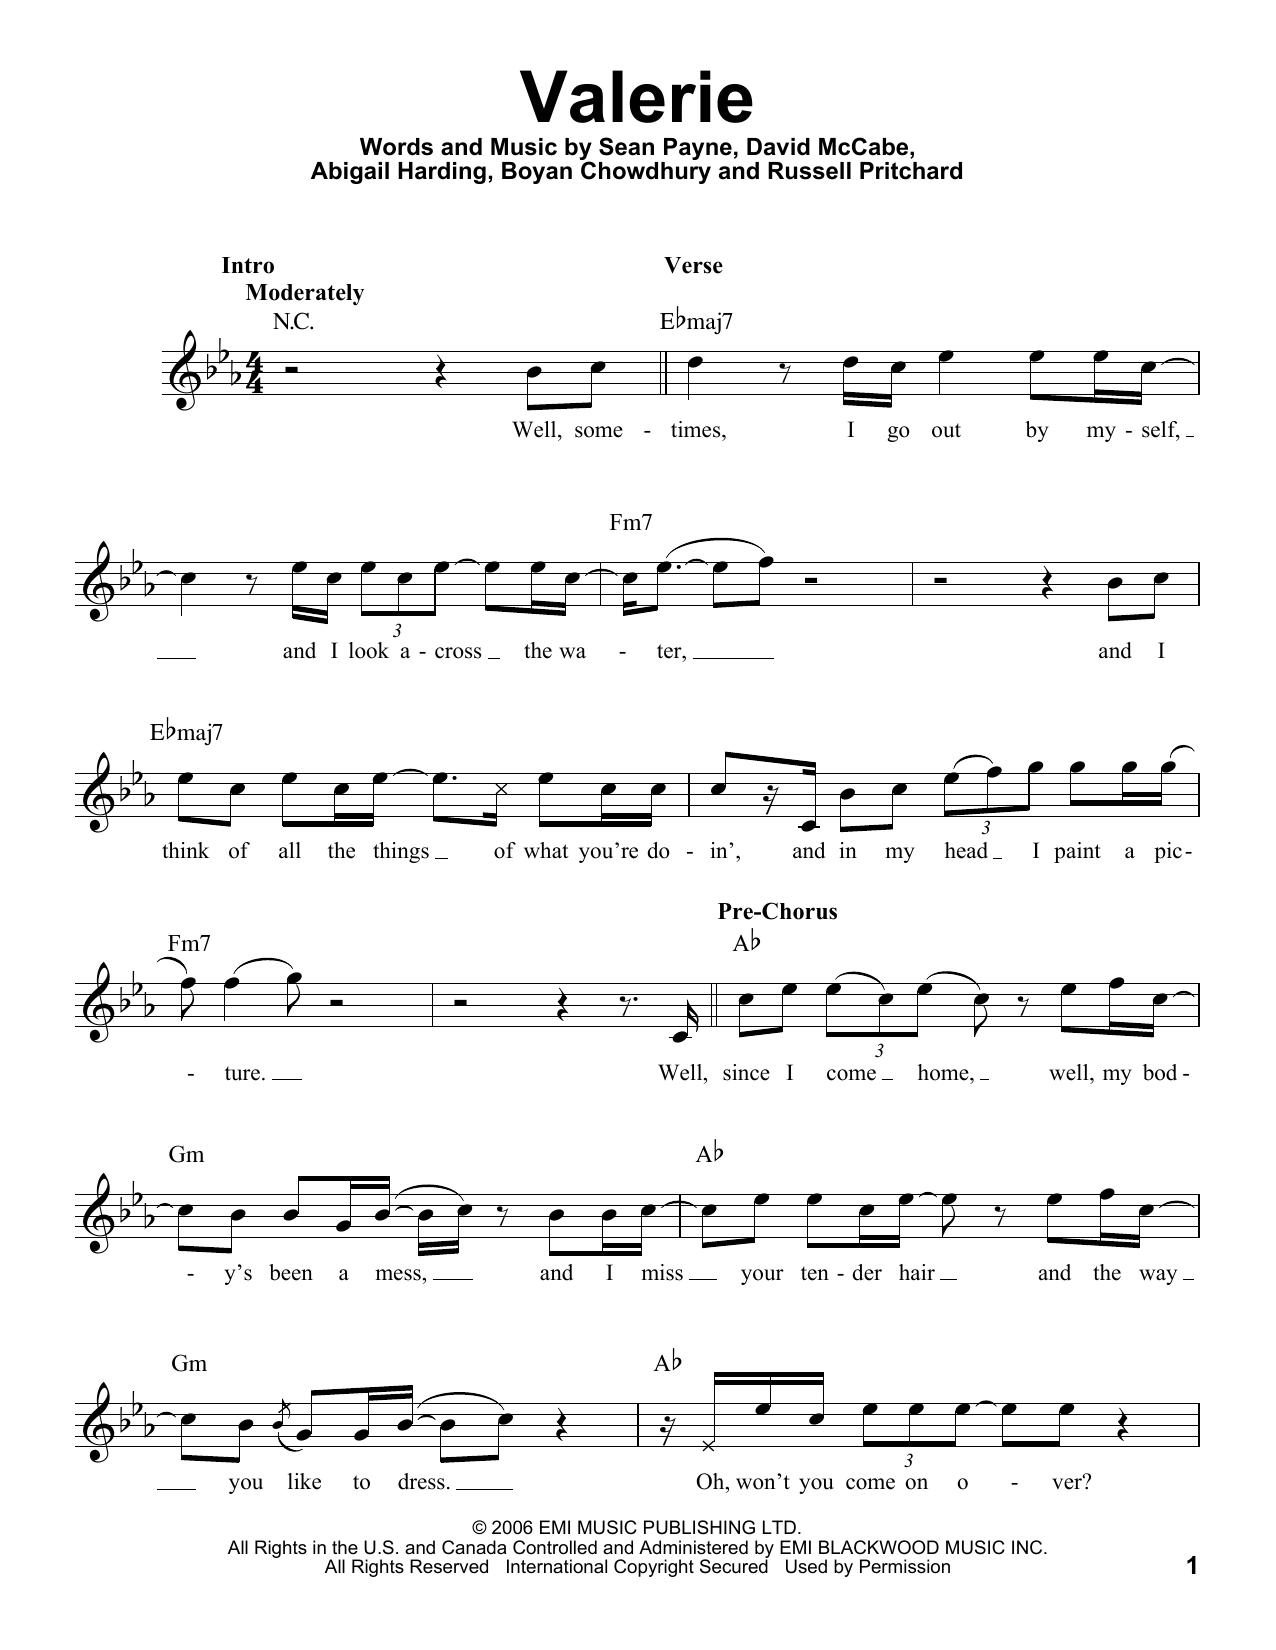 Sheet Music Digital Files To Print Licensed Amy Winehouse Digital